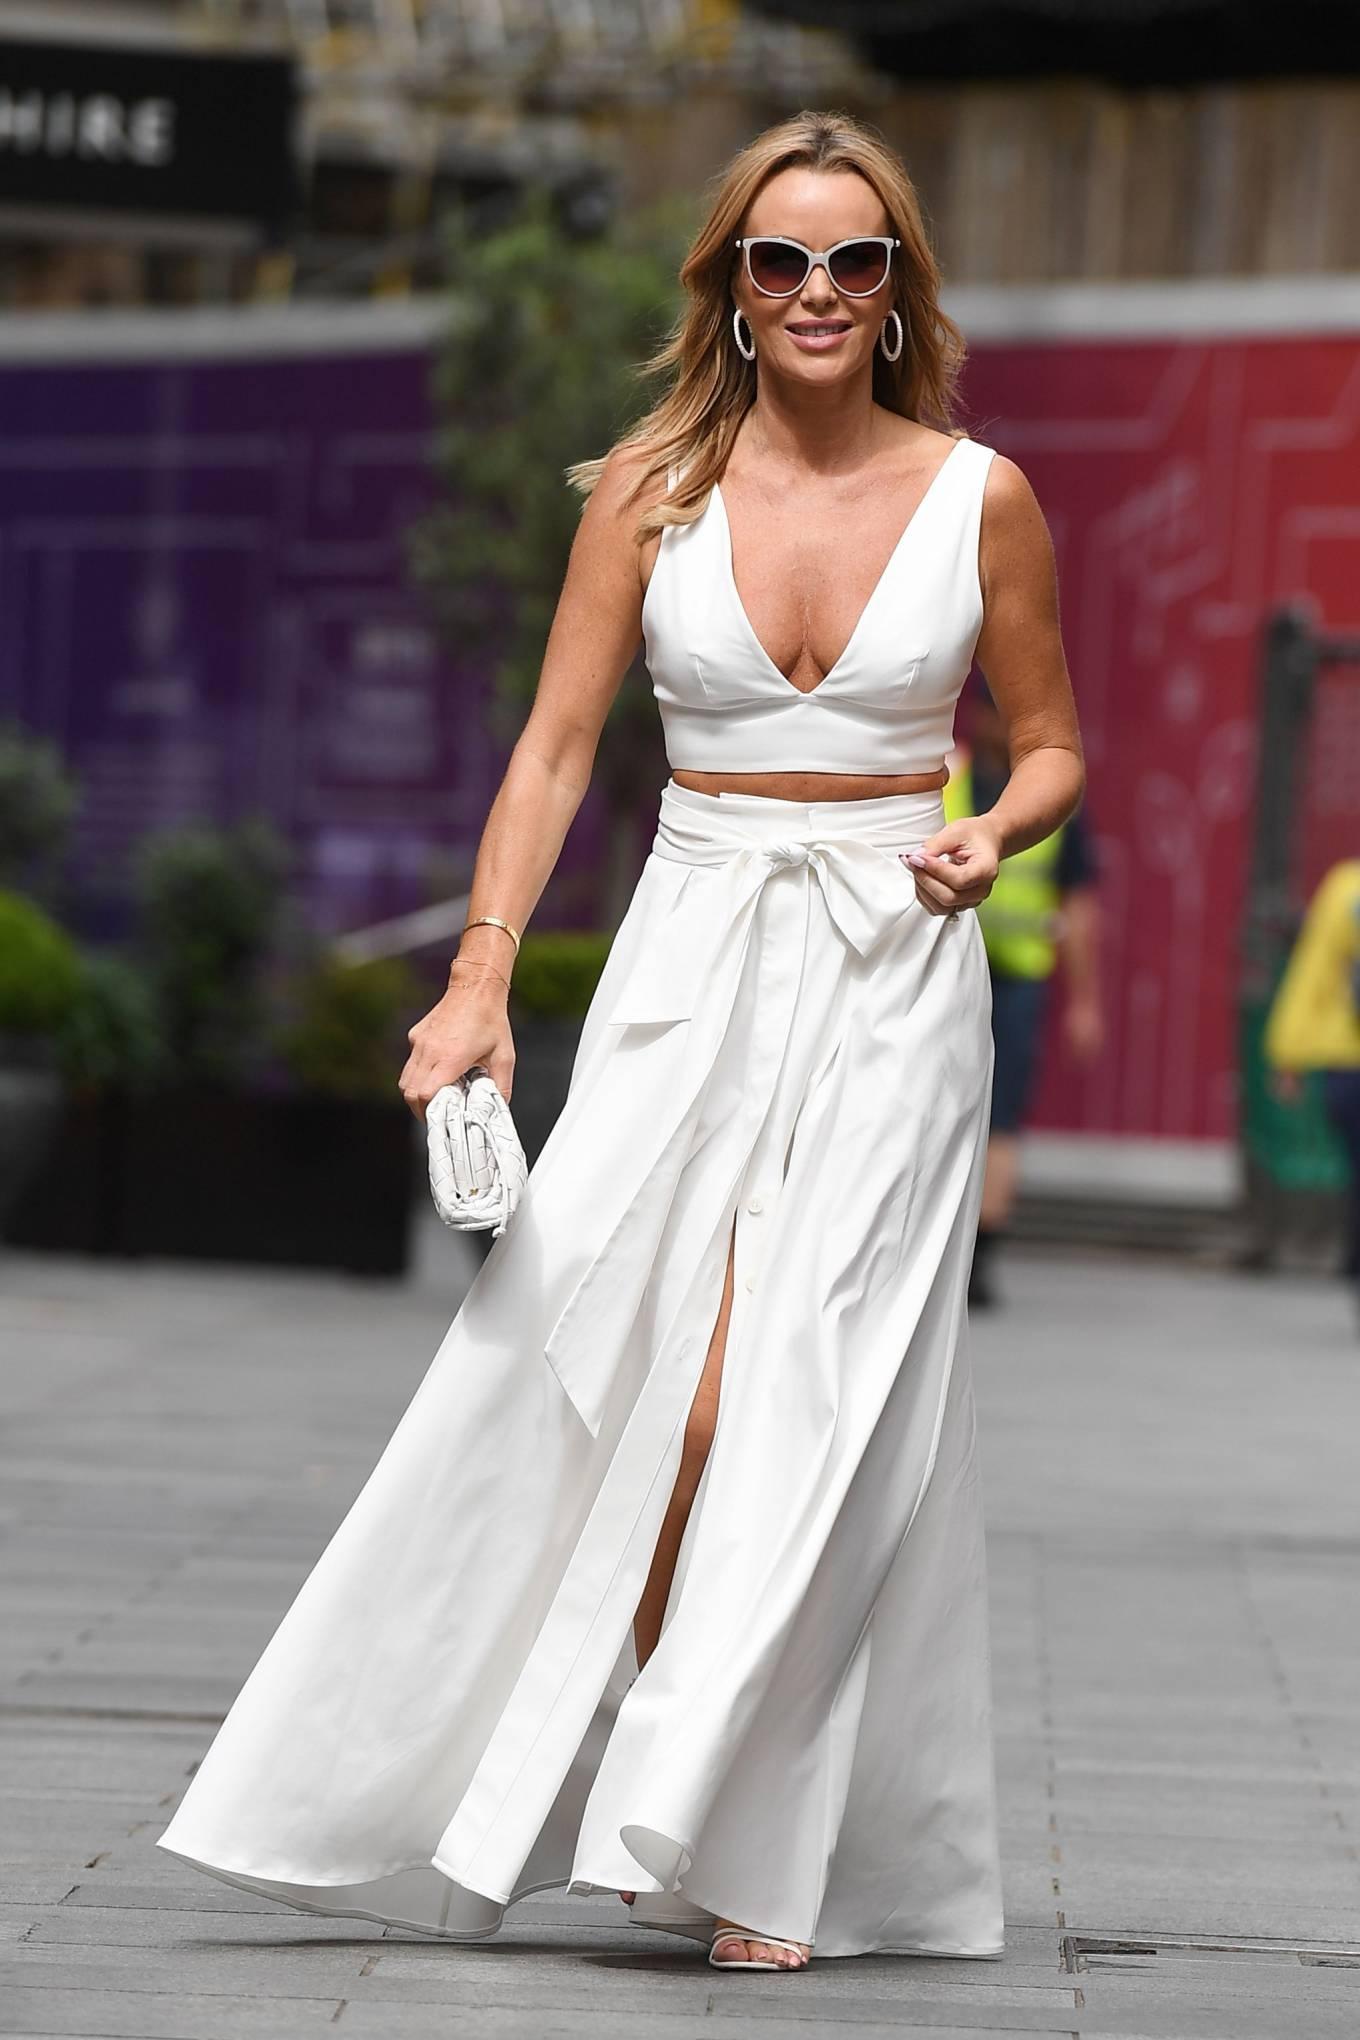 Amanda Holden 2021 : Amanda Holden – In a white dress at Global Studios in London-17